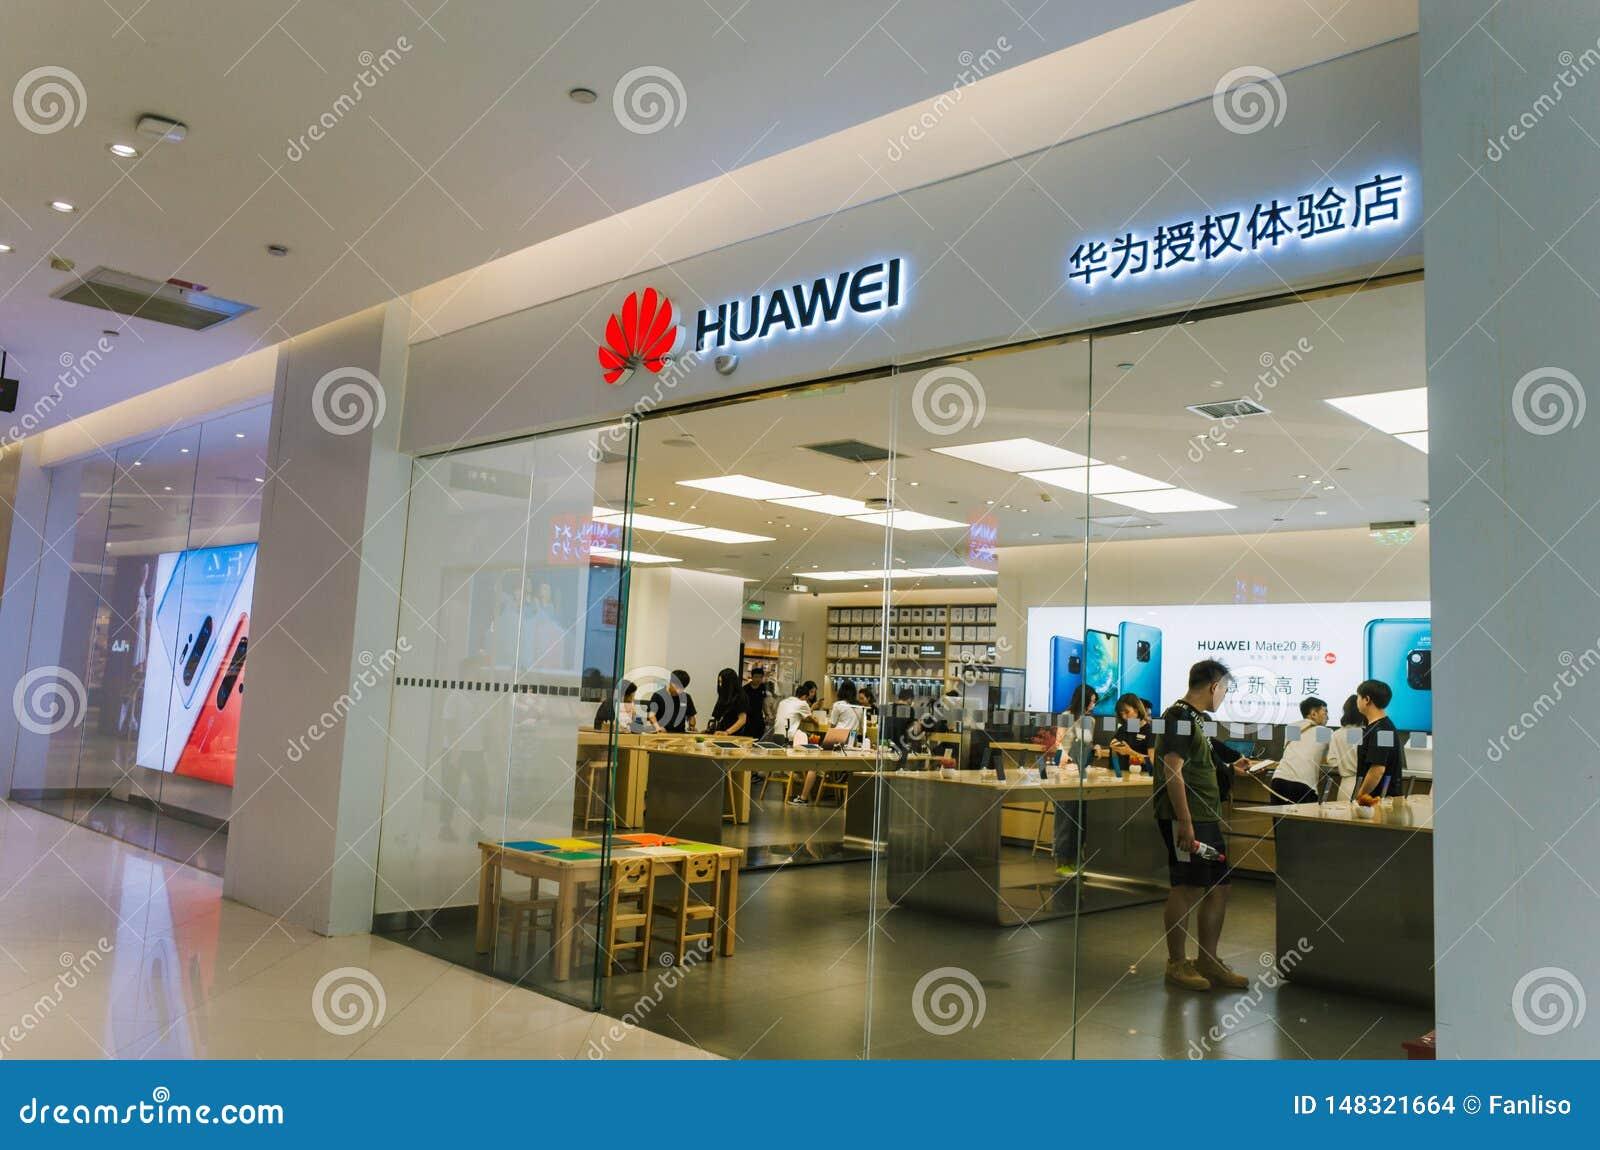 Huawei retail store in Chengdu